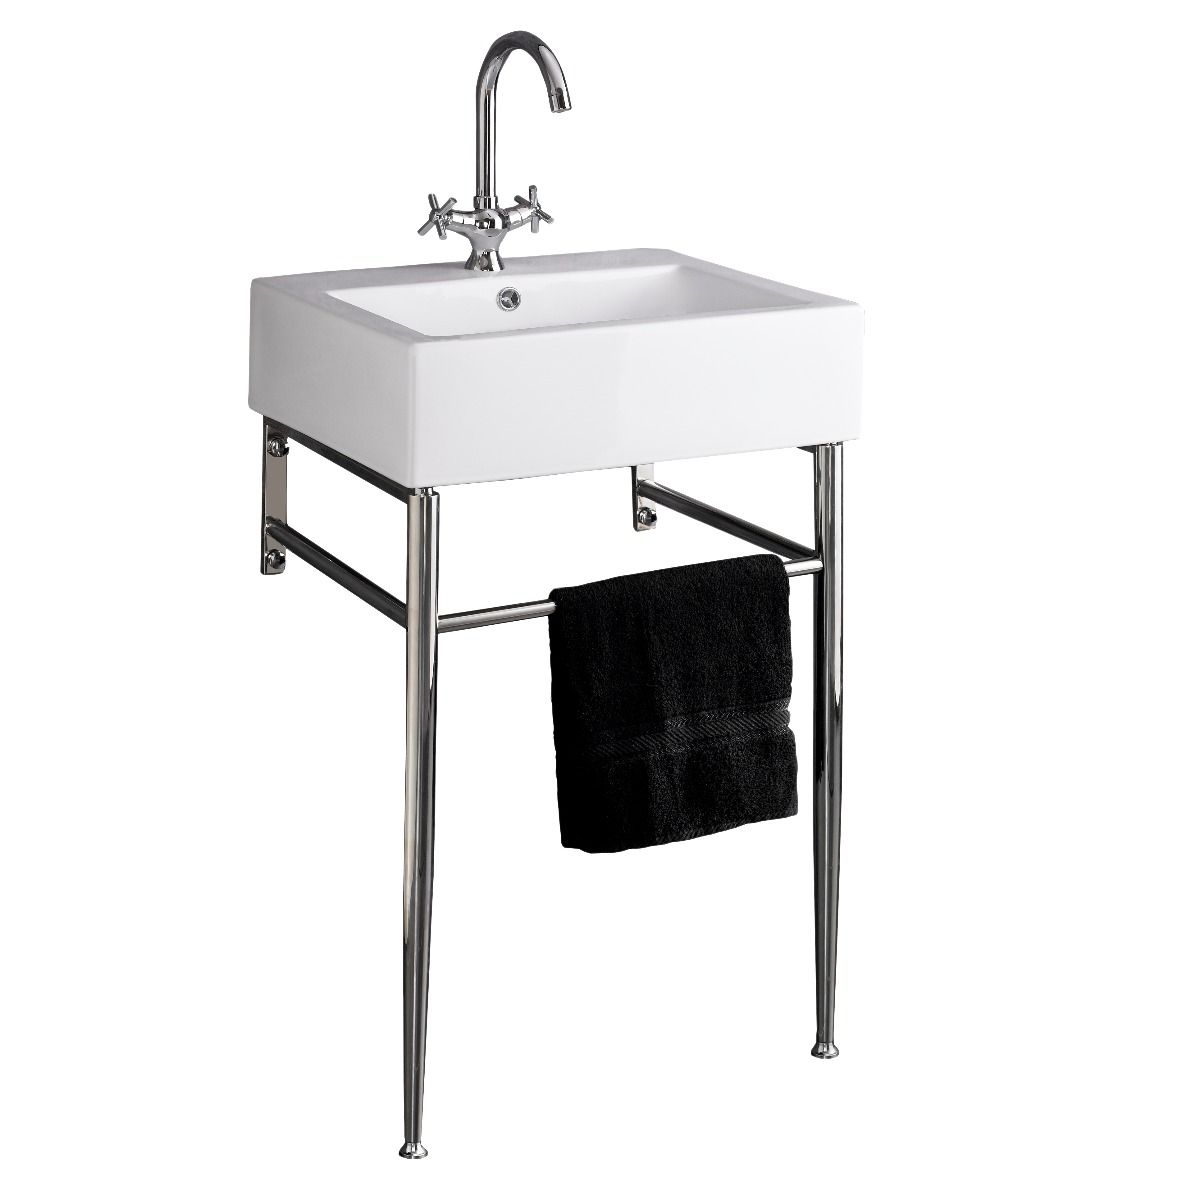 Genoa Belfast Style White Bathroom Washbasin Stainless